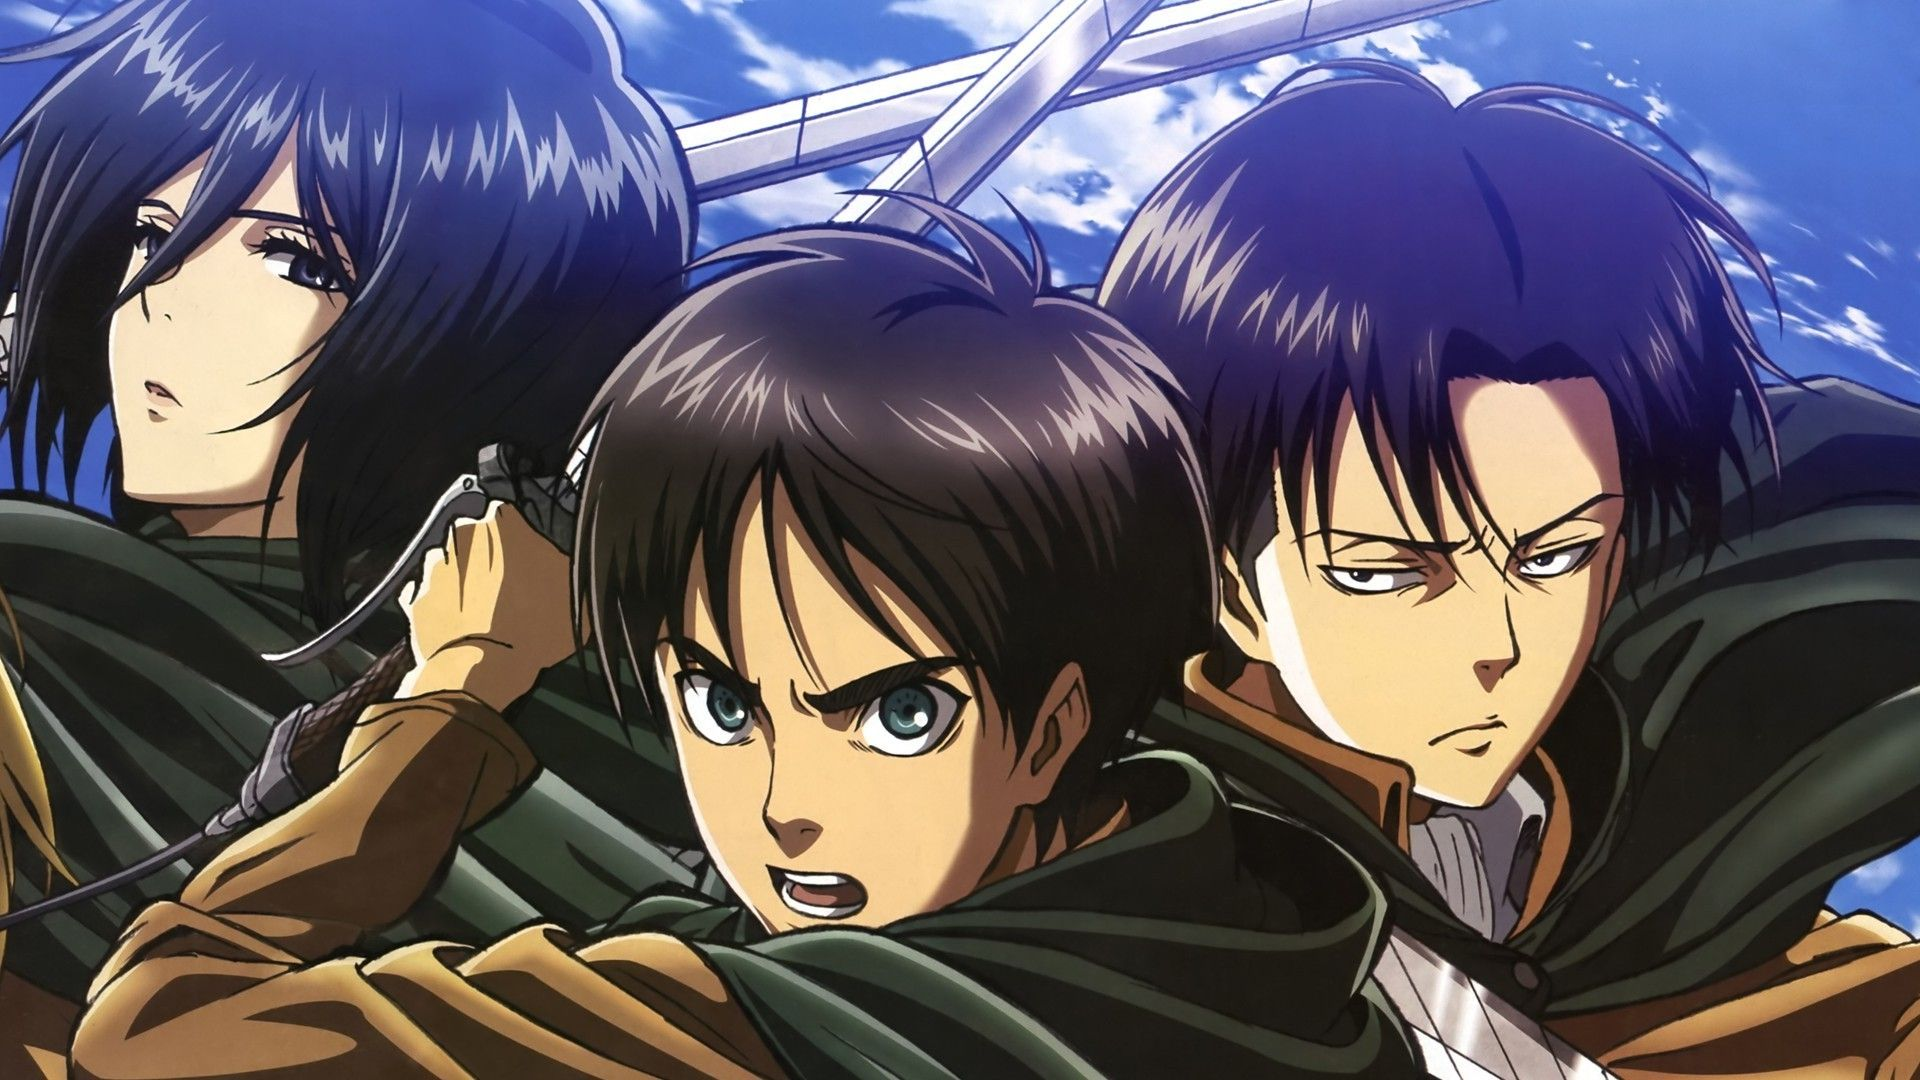 Mikasa Ackerman Eren Yeager And Levi Wallpaper Attack On Titan Anime Anime Attack On Titan